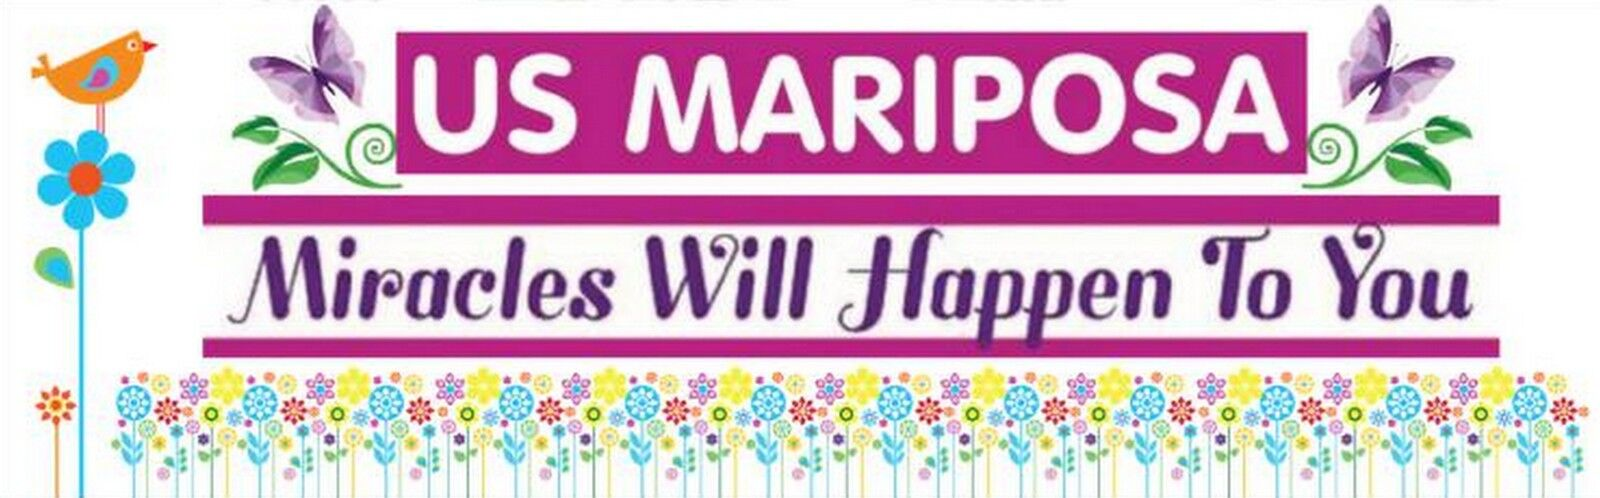 us.mariposa.llc